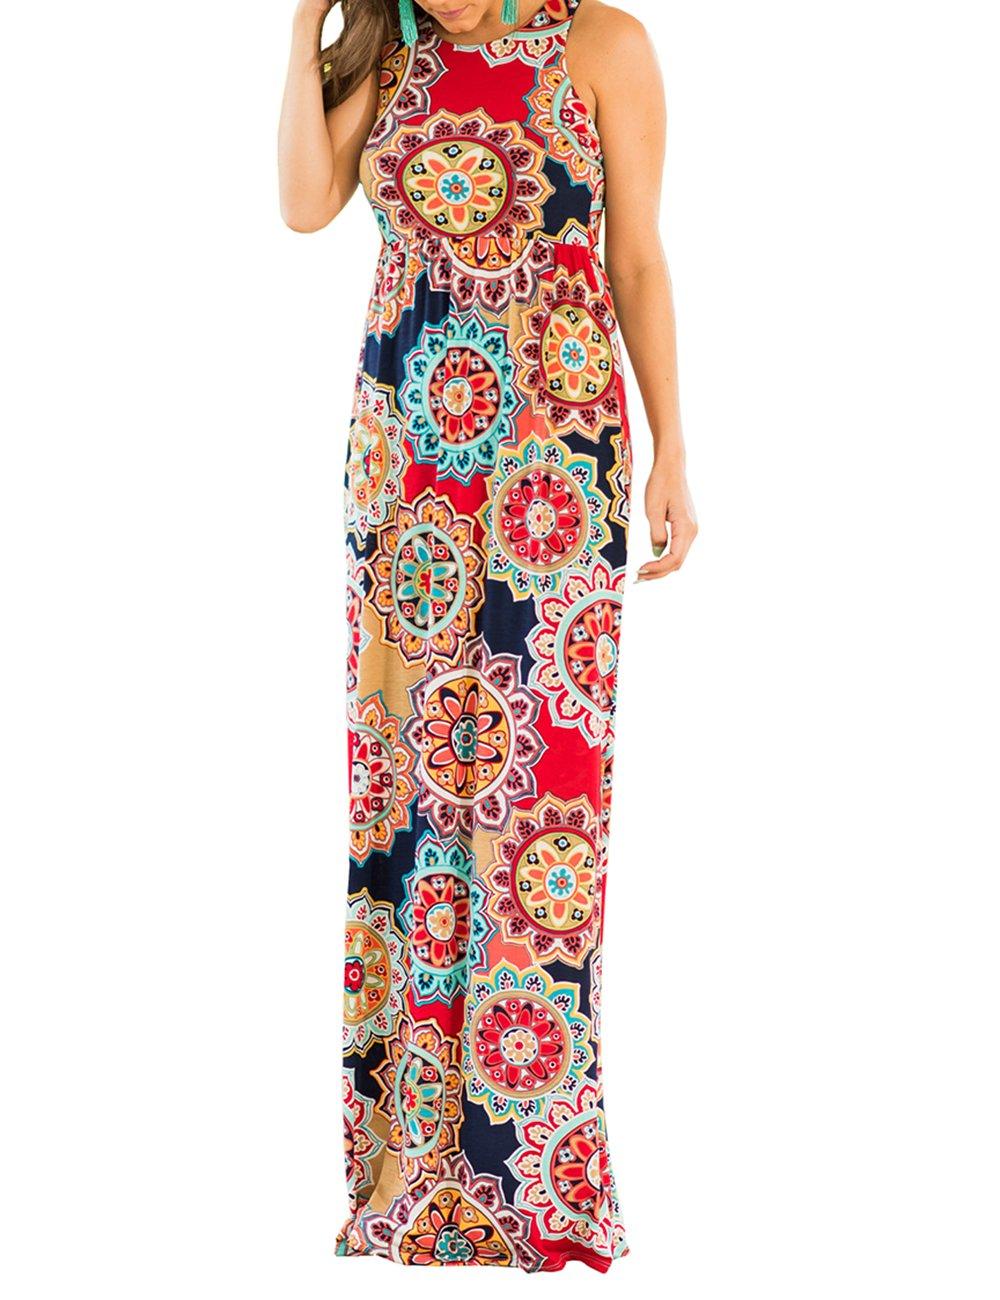 DUNEA Women's Maxi Dress Floral Printed Summer Sleeveless Casual Tunic Long Maxi Dress (X-Large, Medallion1)